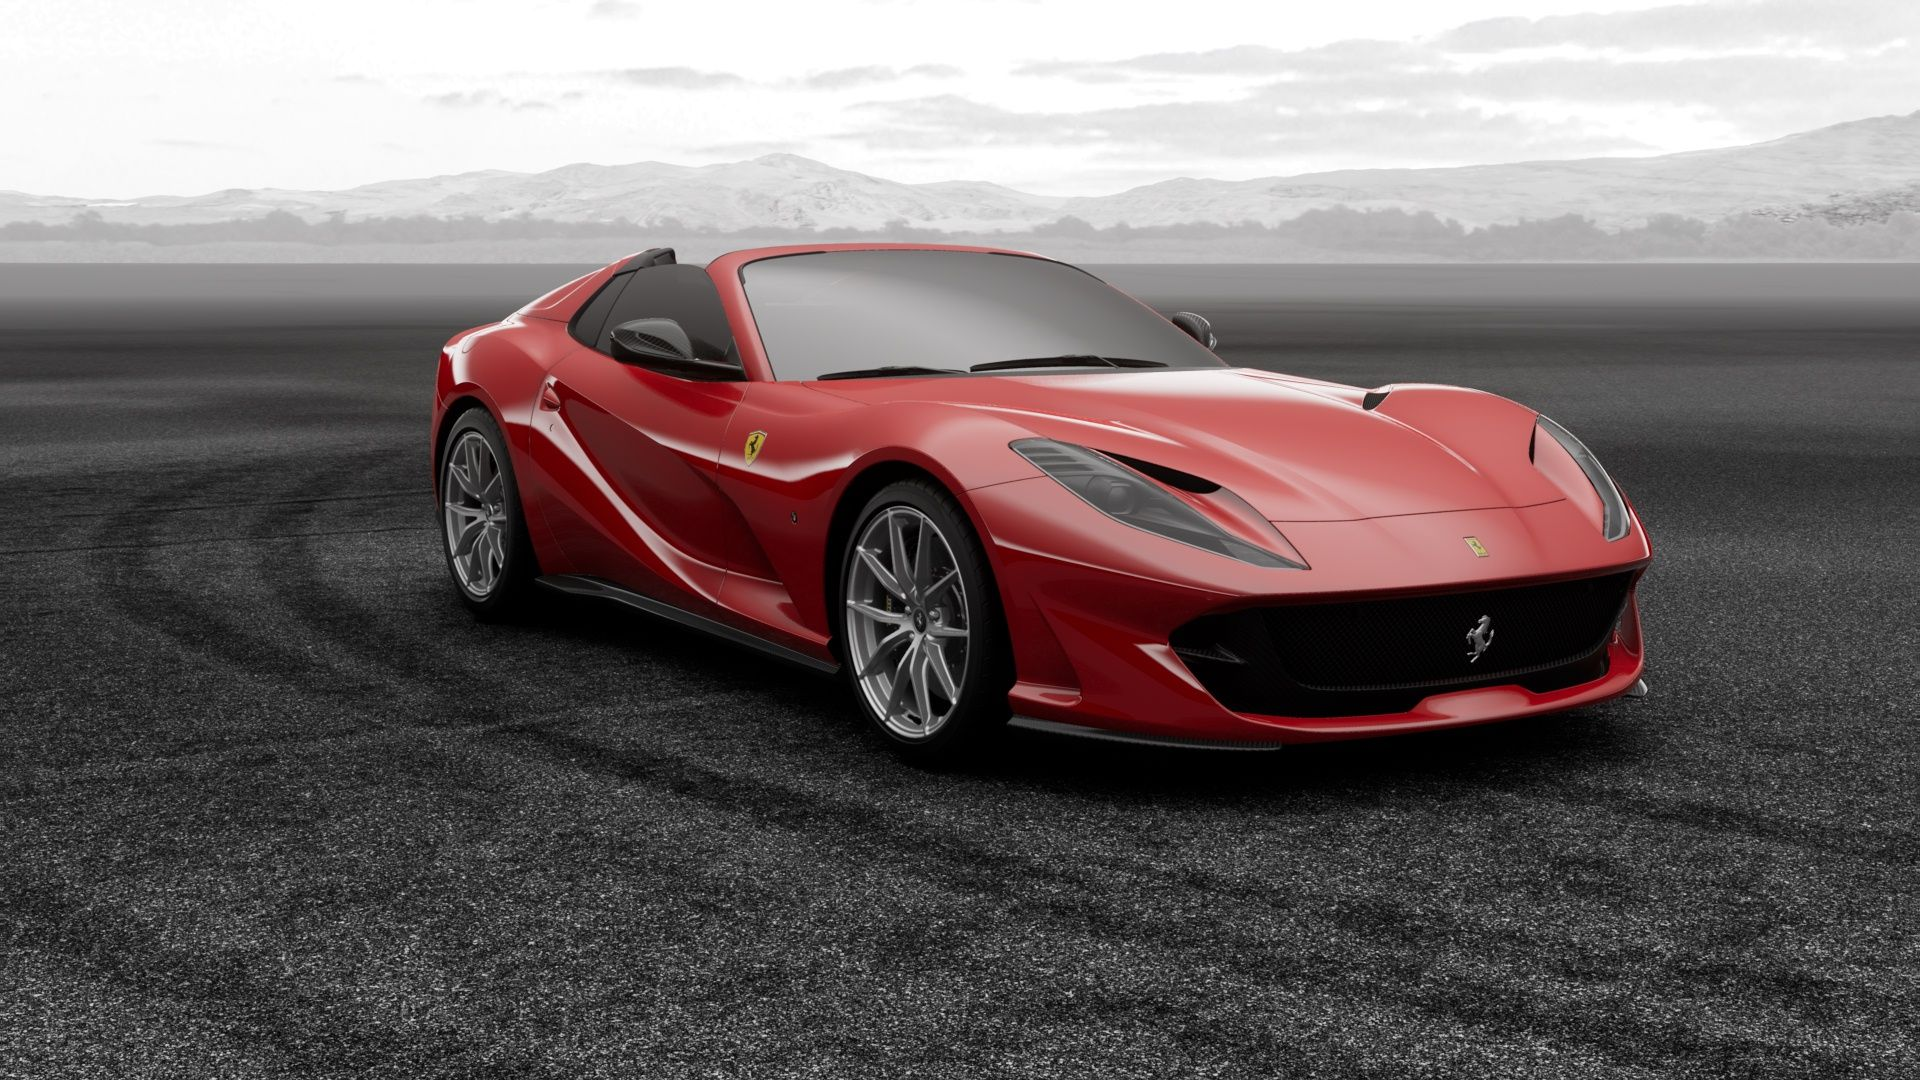 This Is My 812 Gts Build Your Own Ferrari 812gts Down To The Last Detail Ferrari Ferrari Dealership Car Inspiration